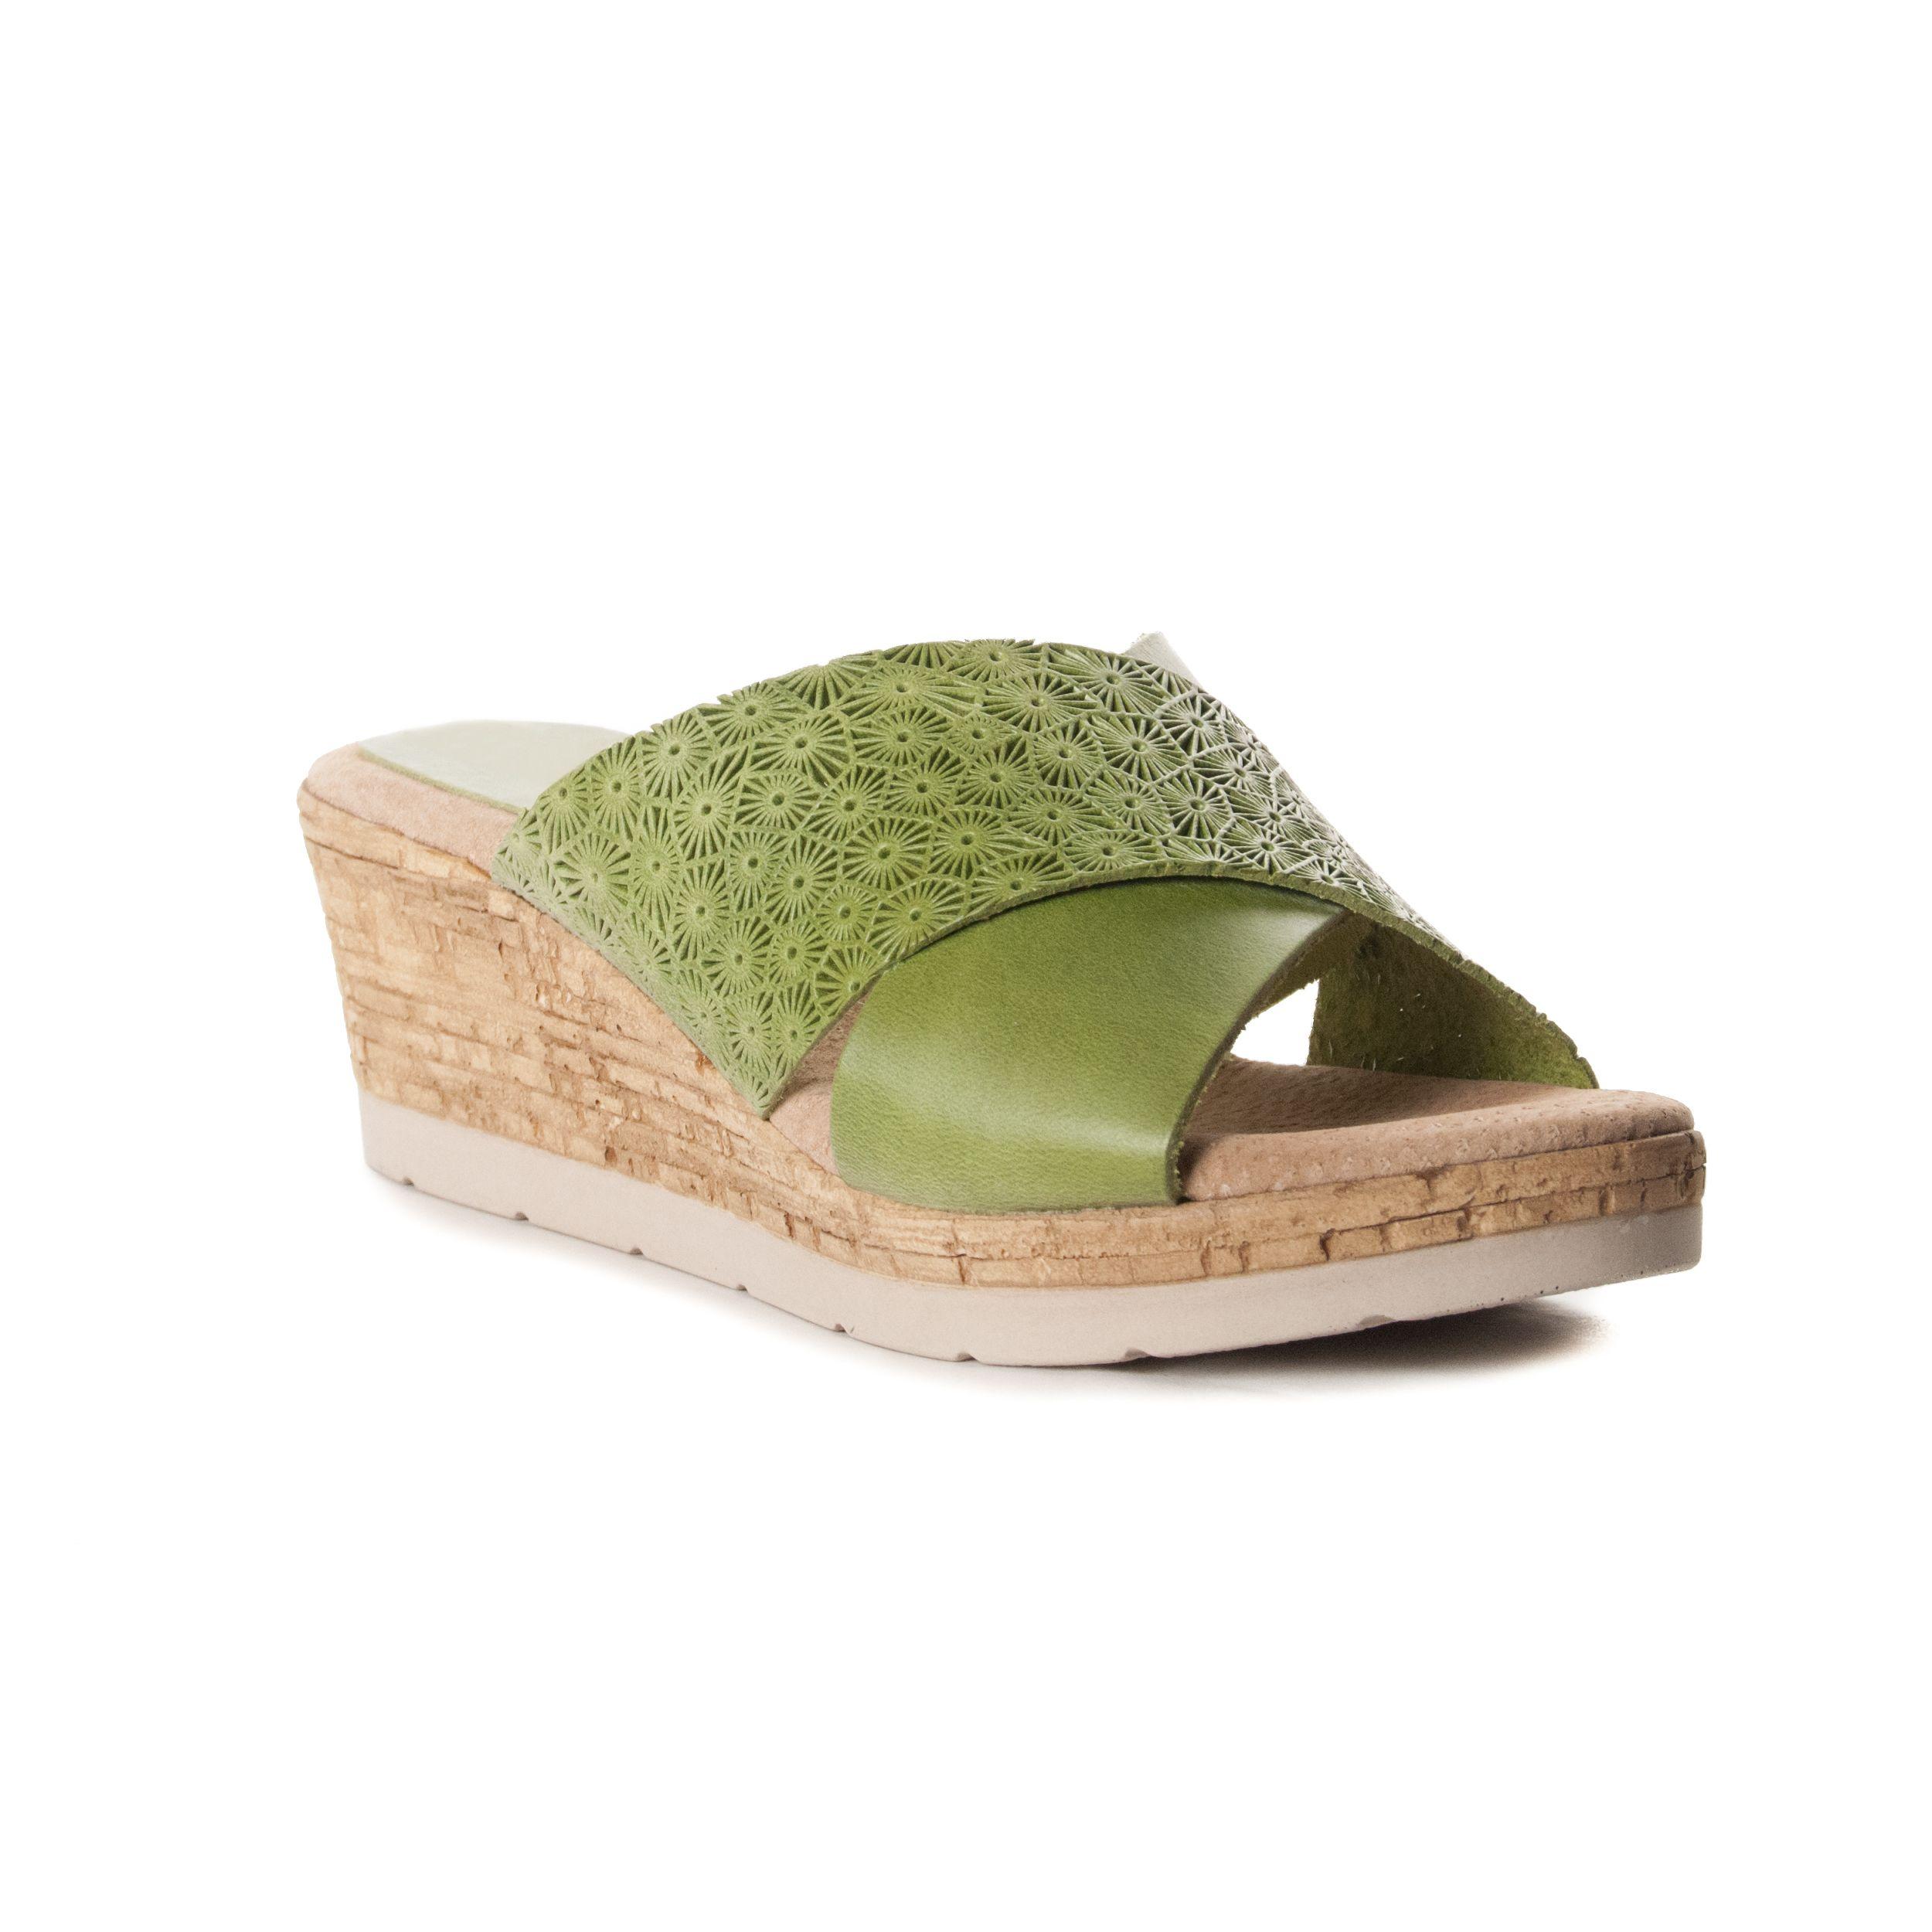 Montevita Chunky Heel Sandal in Green